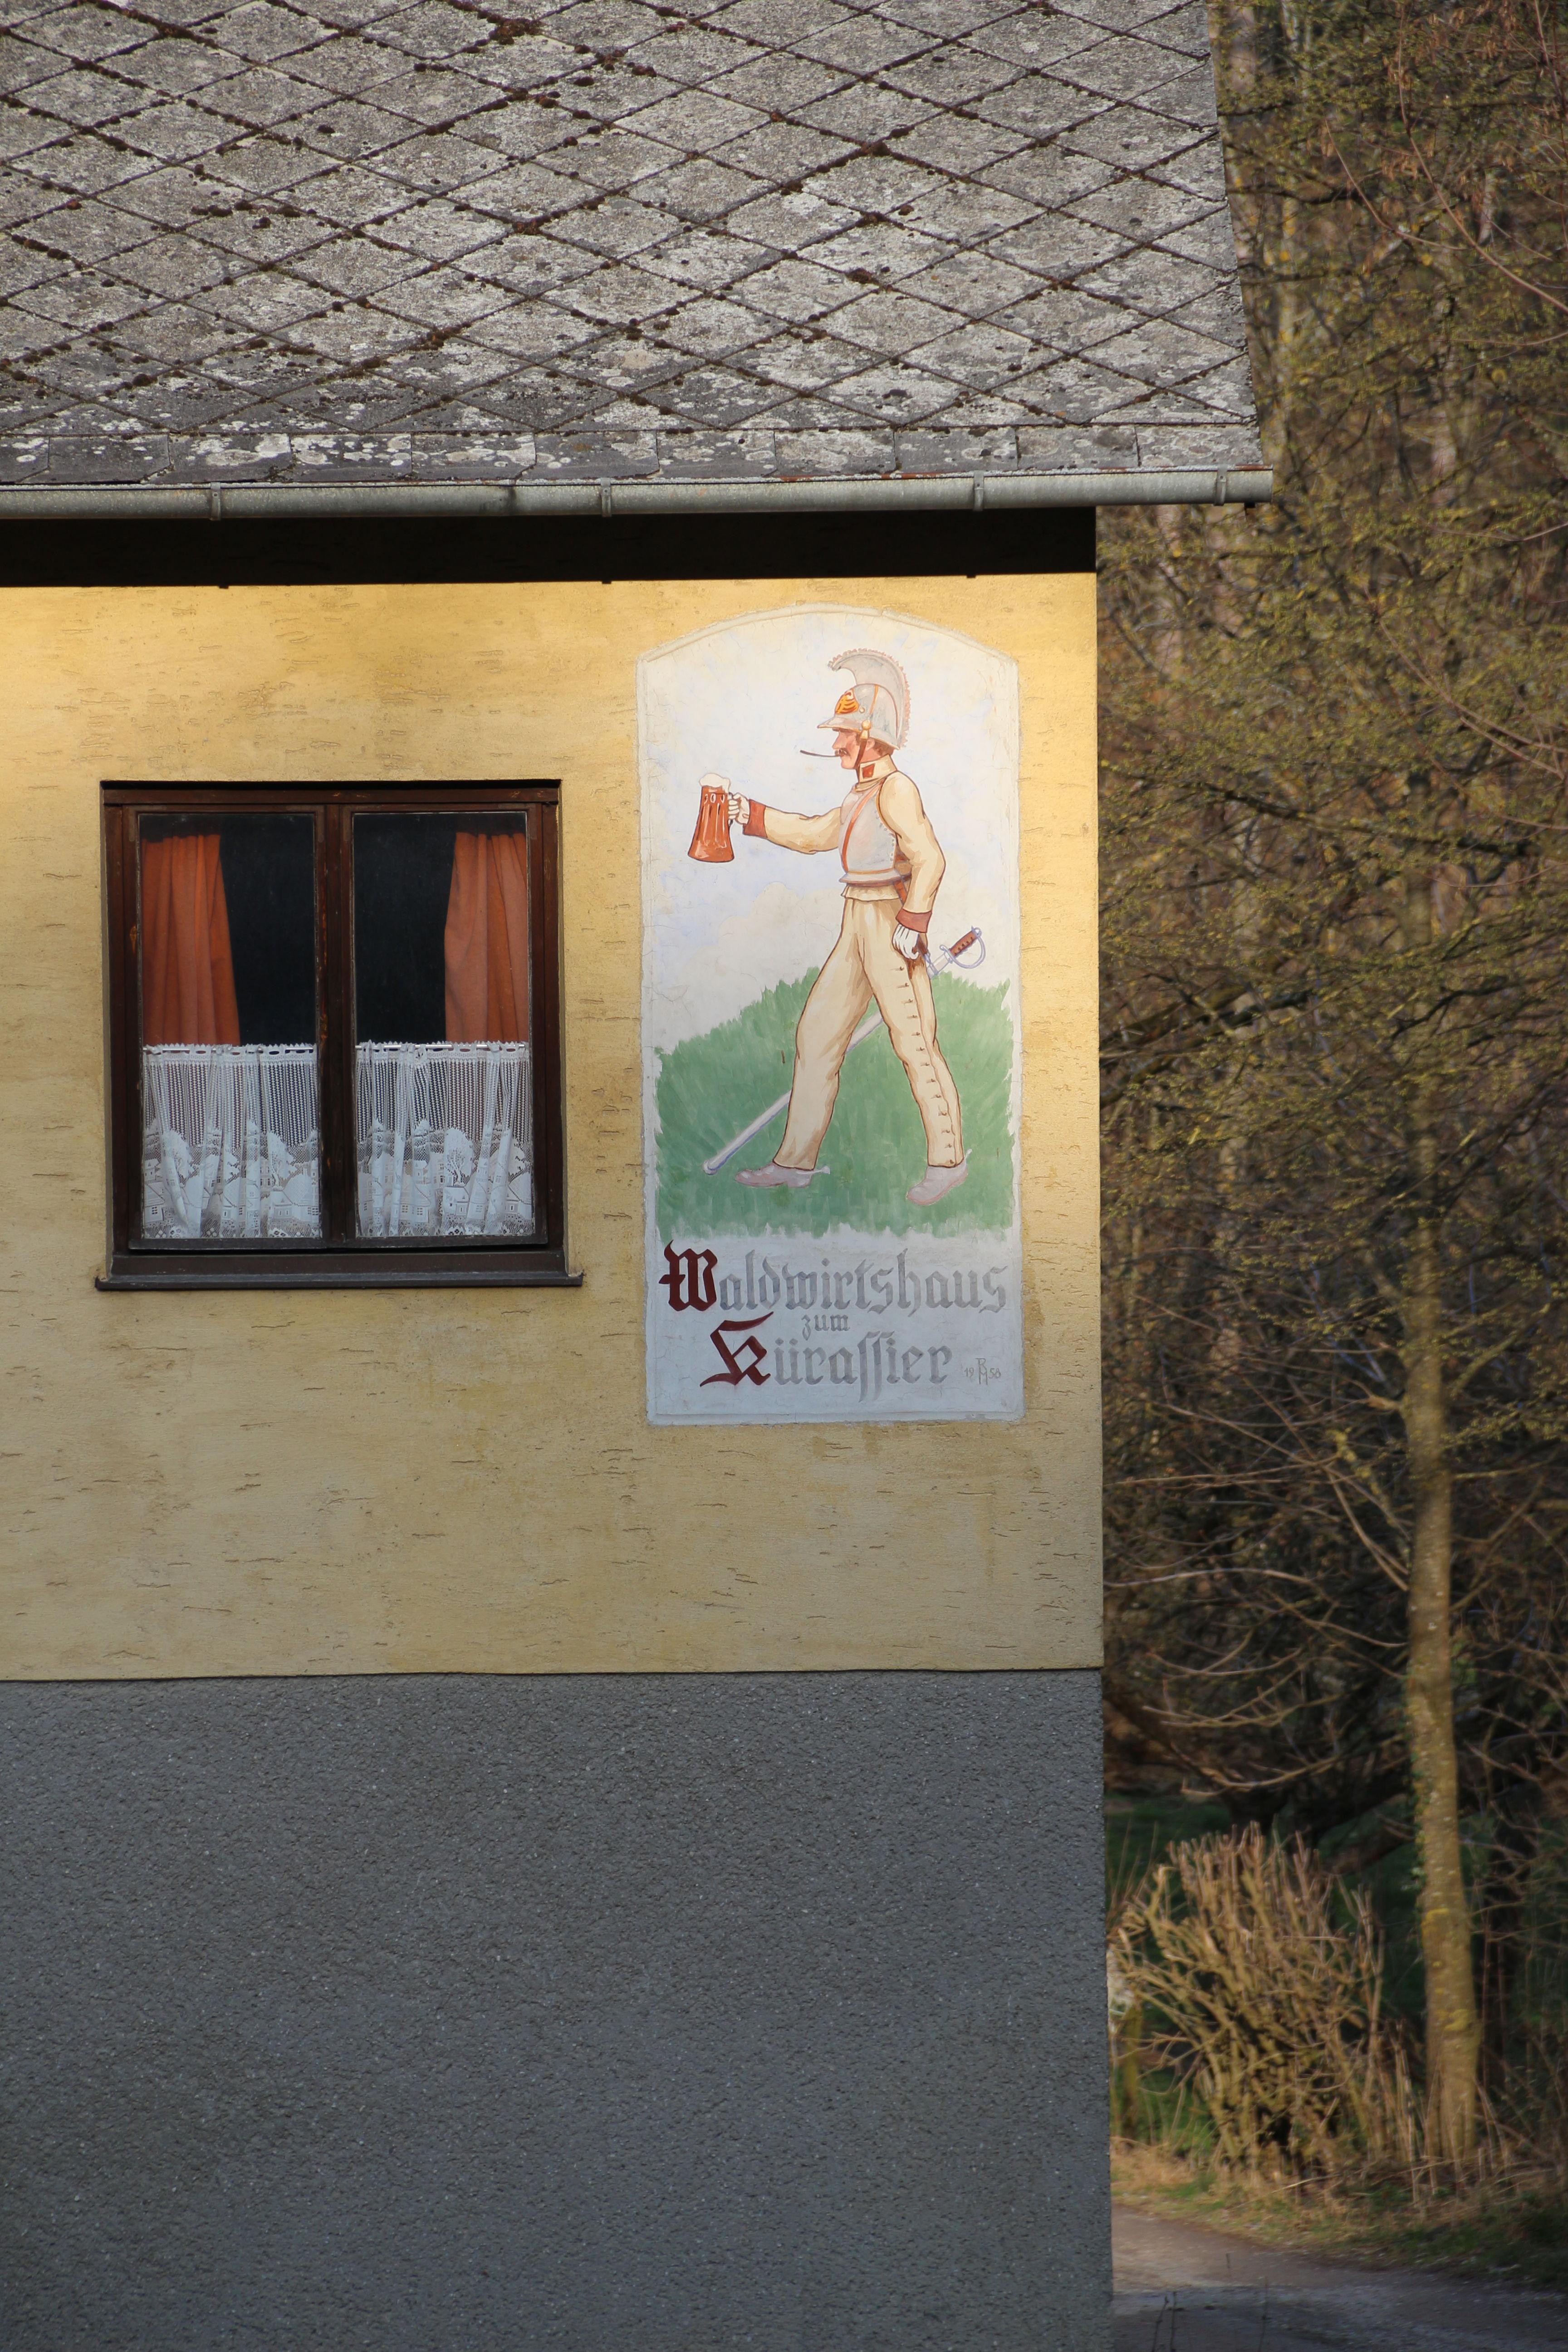 Dating Events Bad Fischau-Brunn Partnervermittlung Aus Puchheim